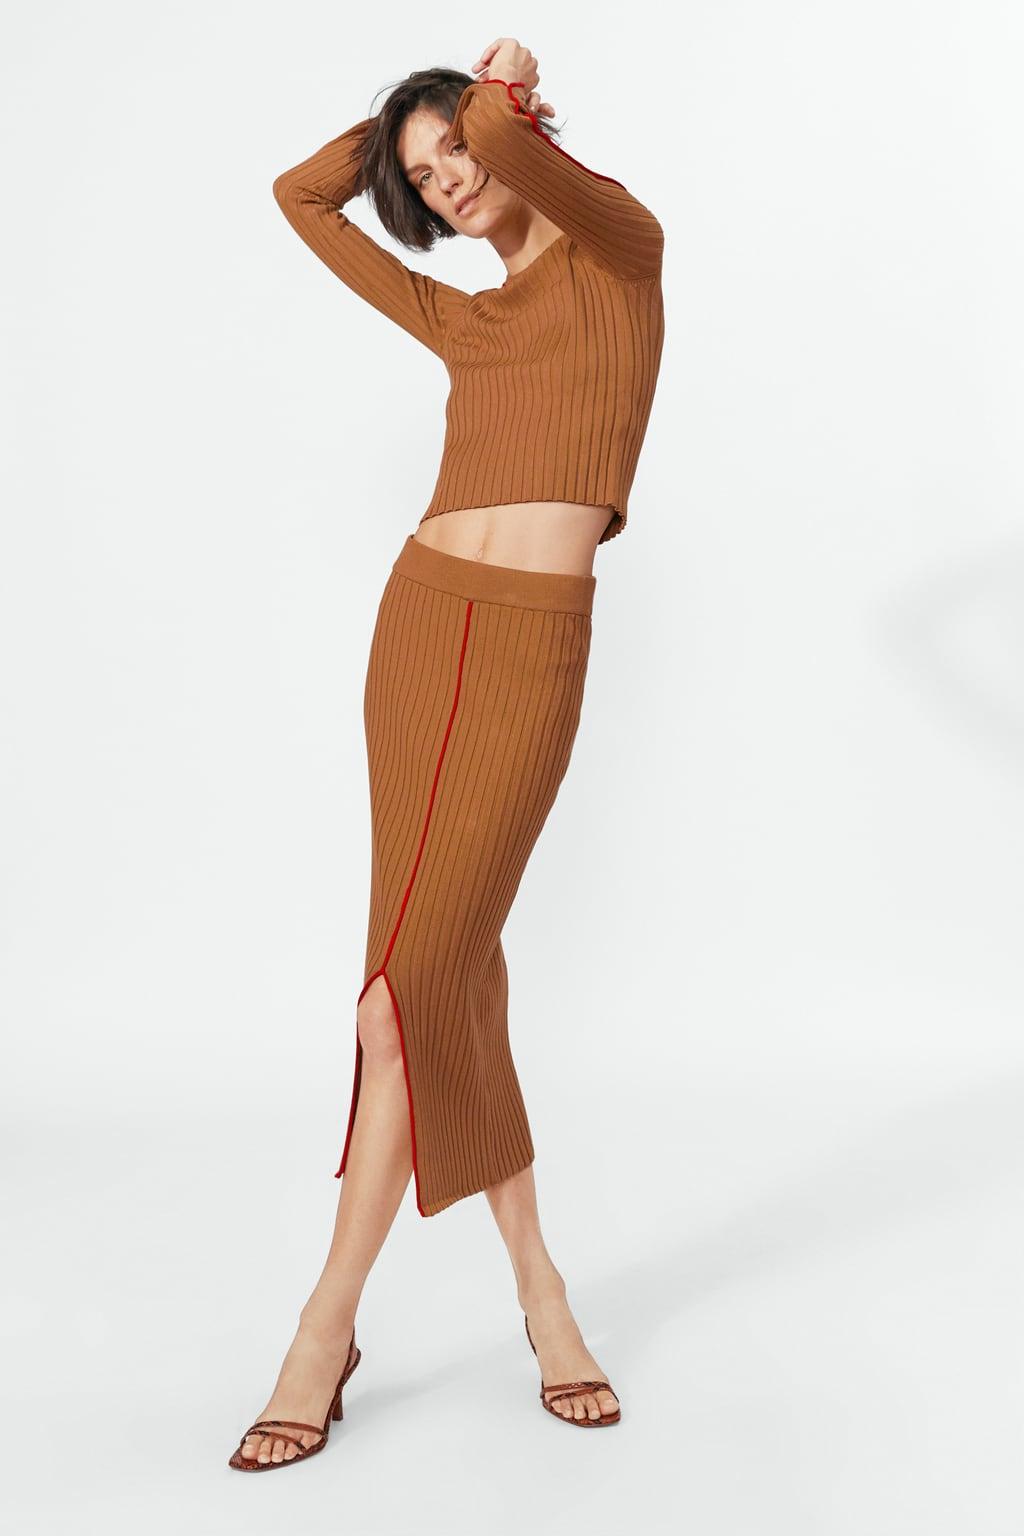 a1ae9c3ff154 Urban Outfitters + UO Jumbo Corduroy Button-Down Mini Skirt